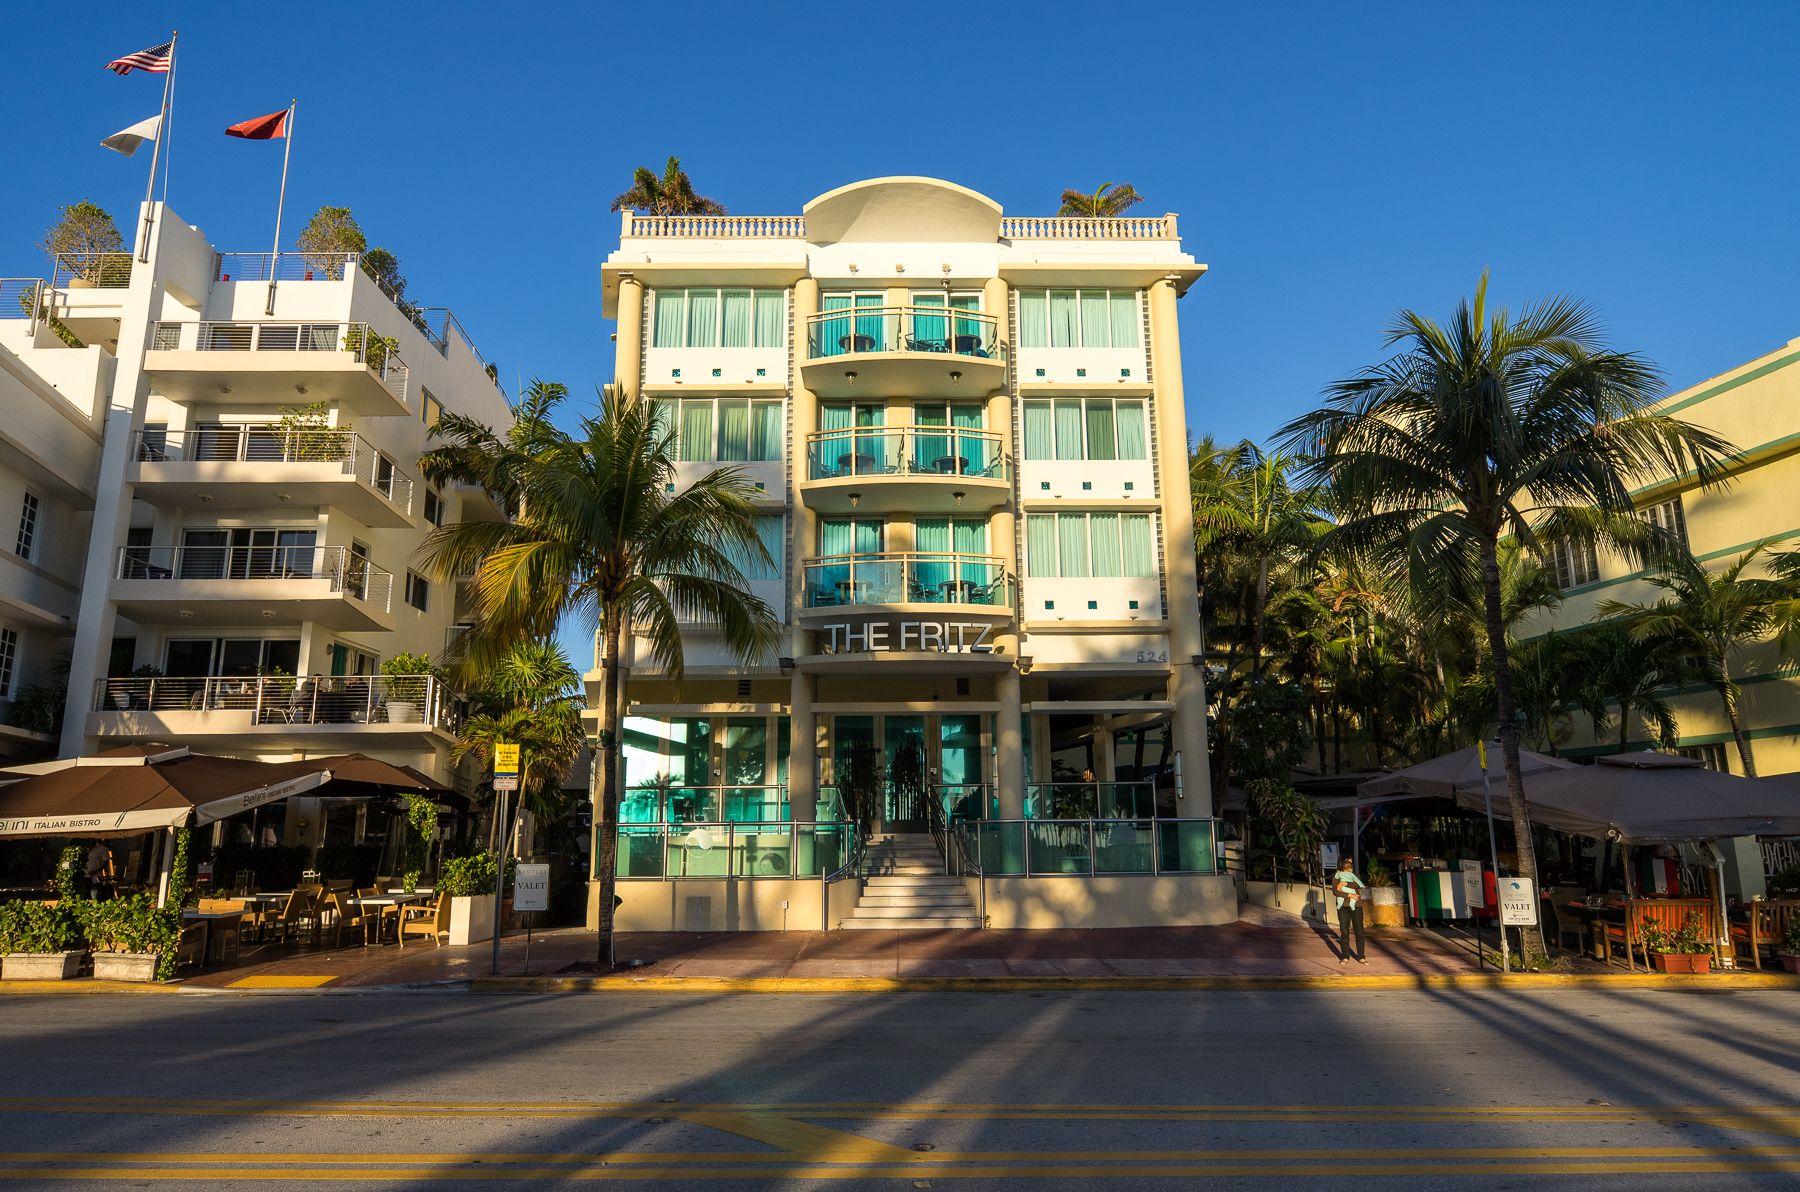 Image Result For The Fritz Hotel Miami Arabian Horses Vibrant